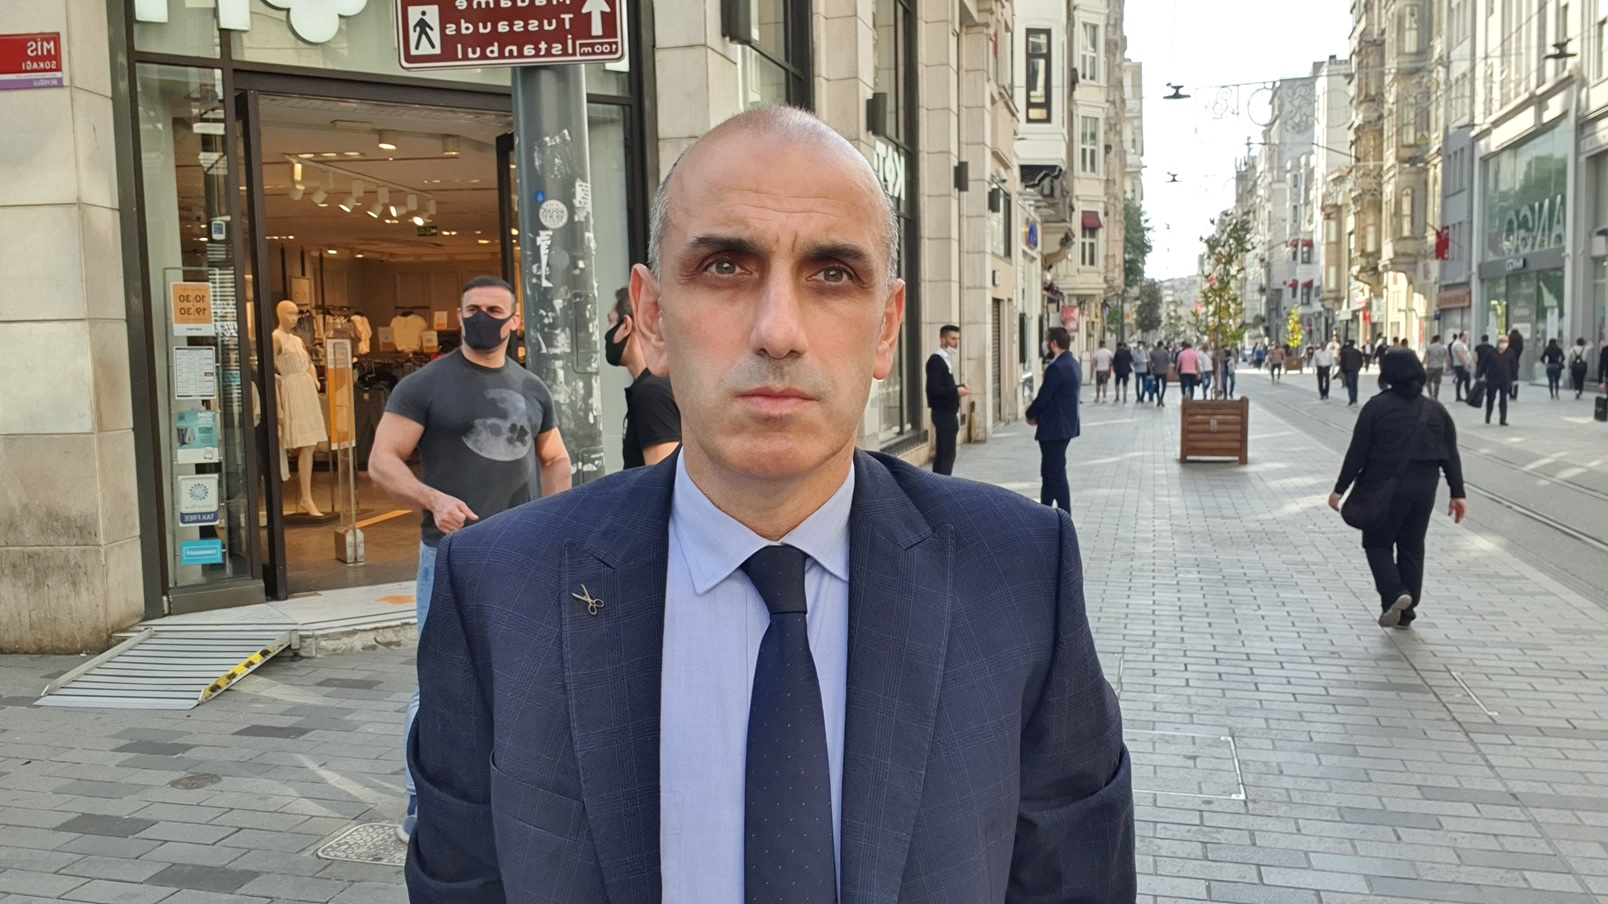 Turkey is raising barriers in international trade